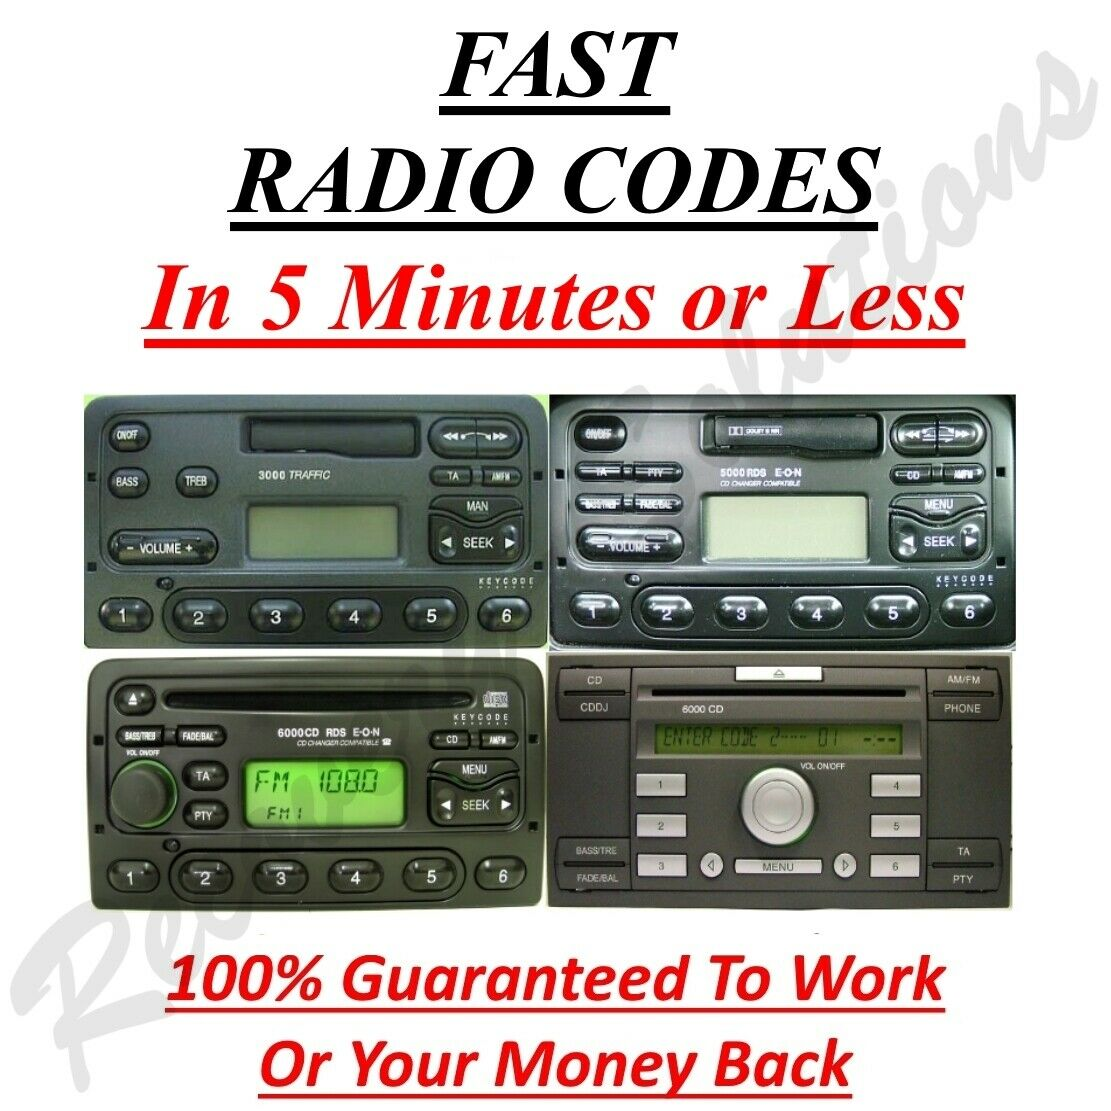 Escort pats codes ford